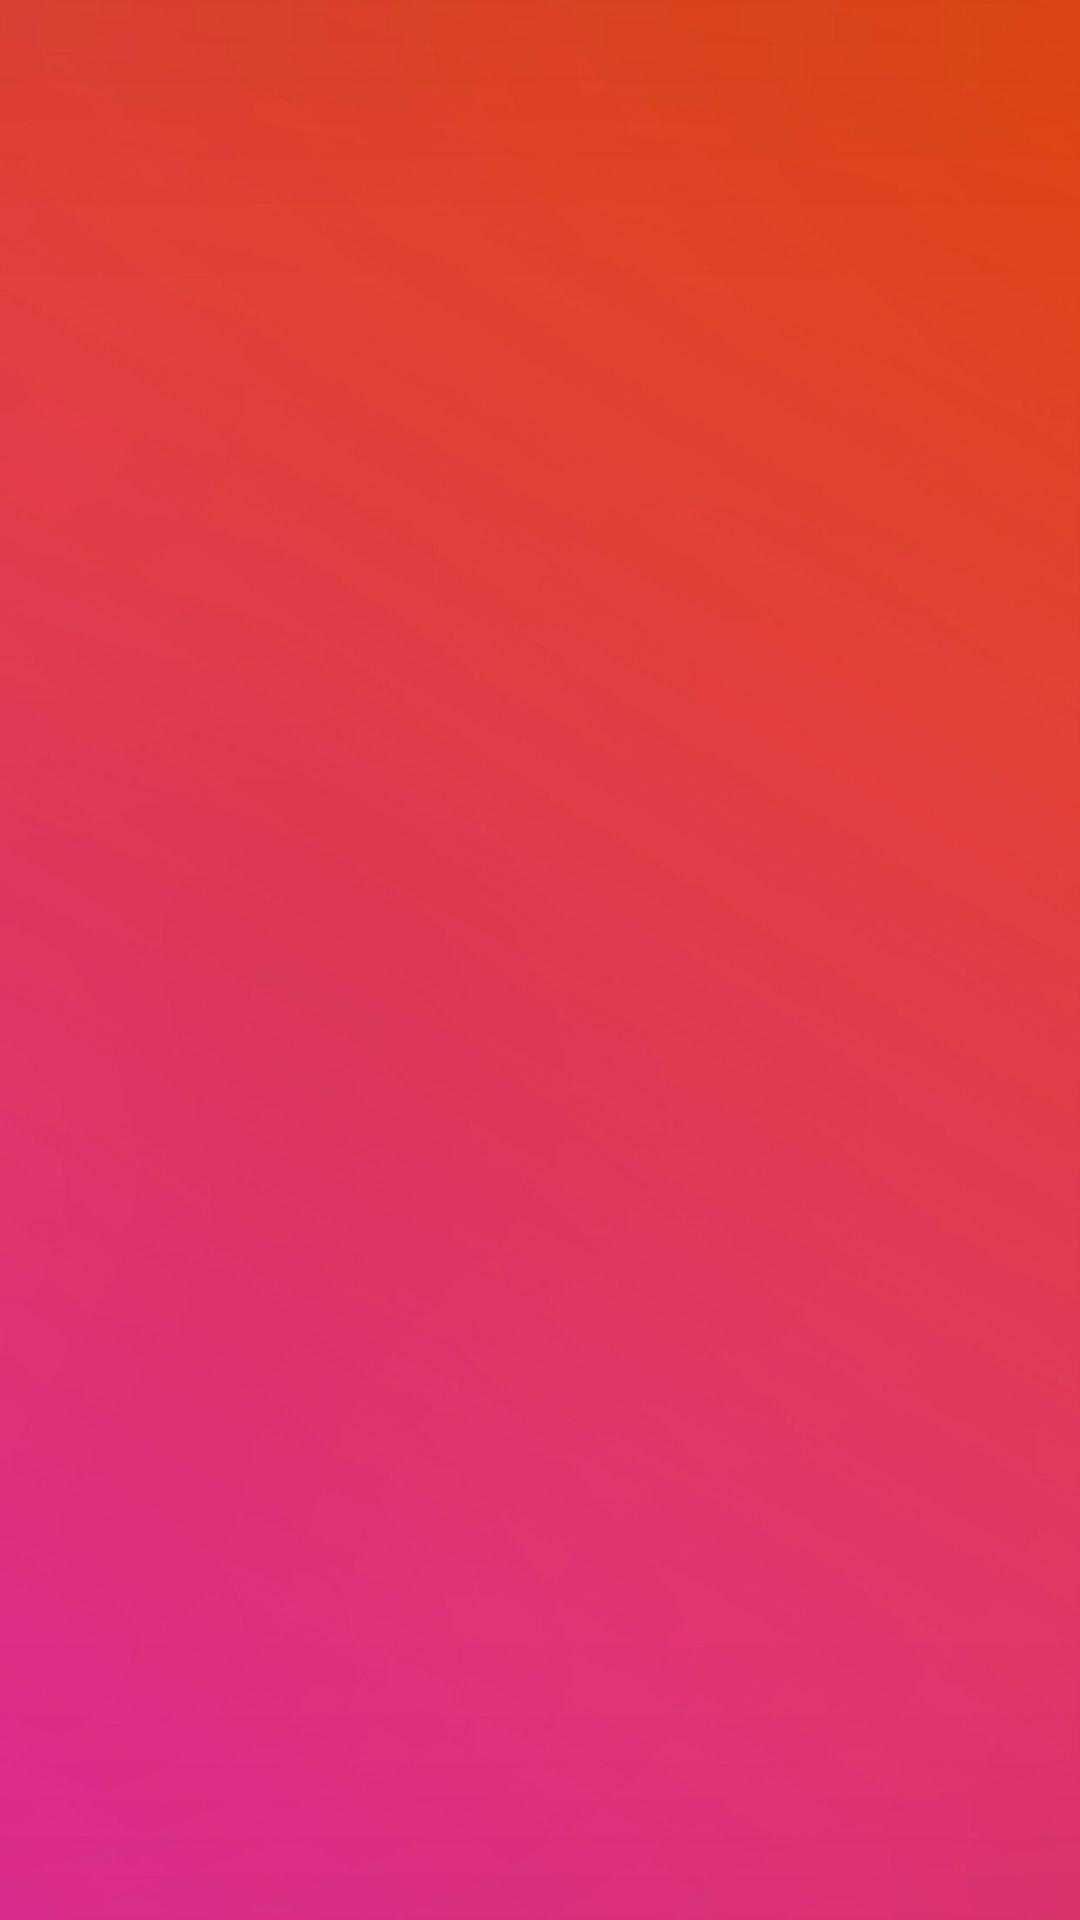 Red orange combination inside gradation blur iphone 6 - Color gradation wallpaper ...